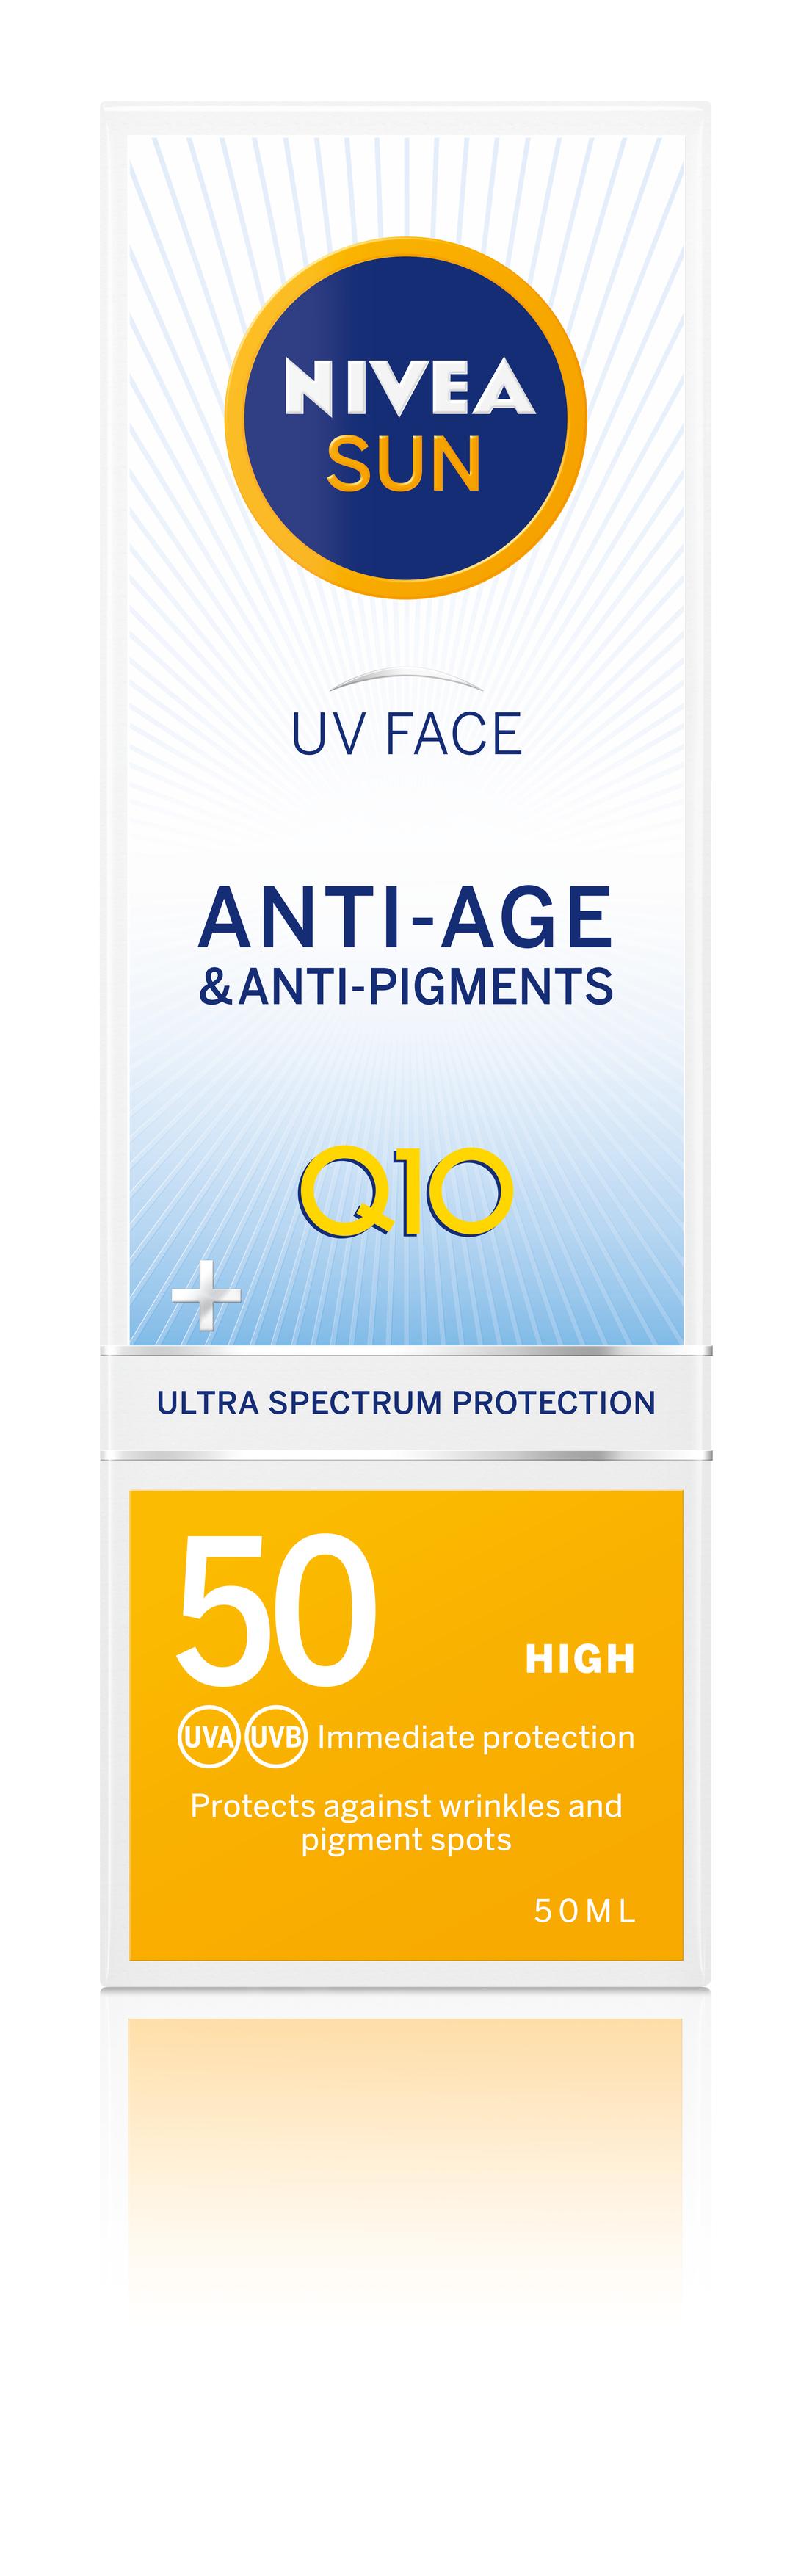 NIVEA SUN UV Face Q10 SPF50